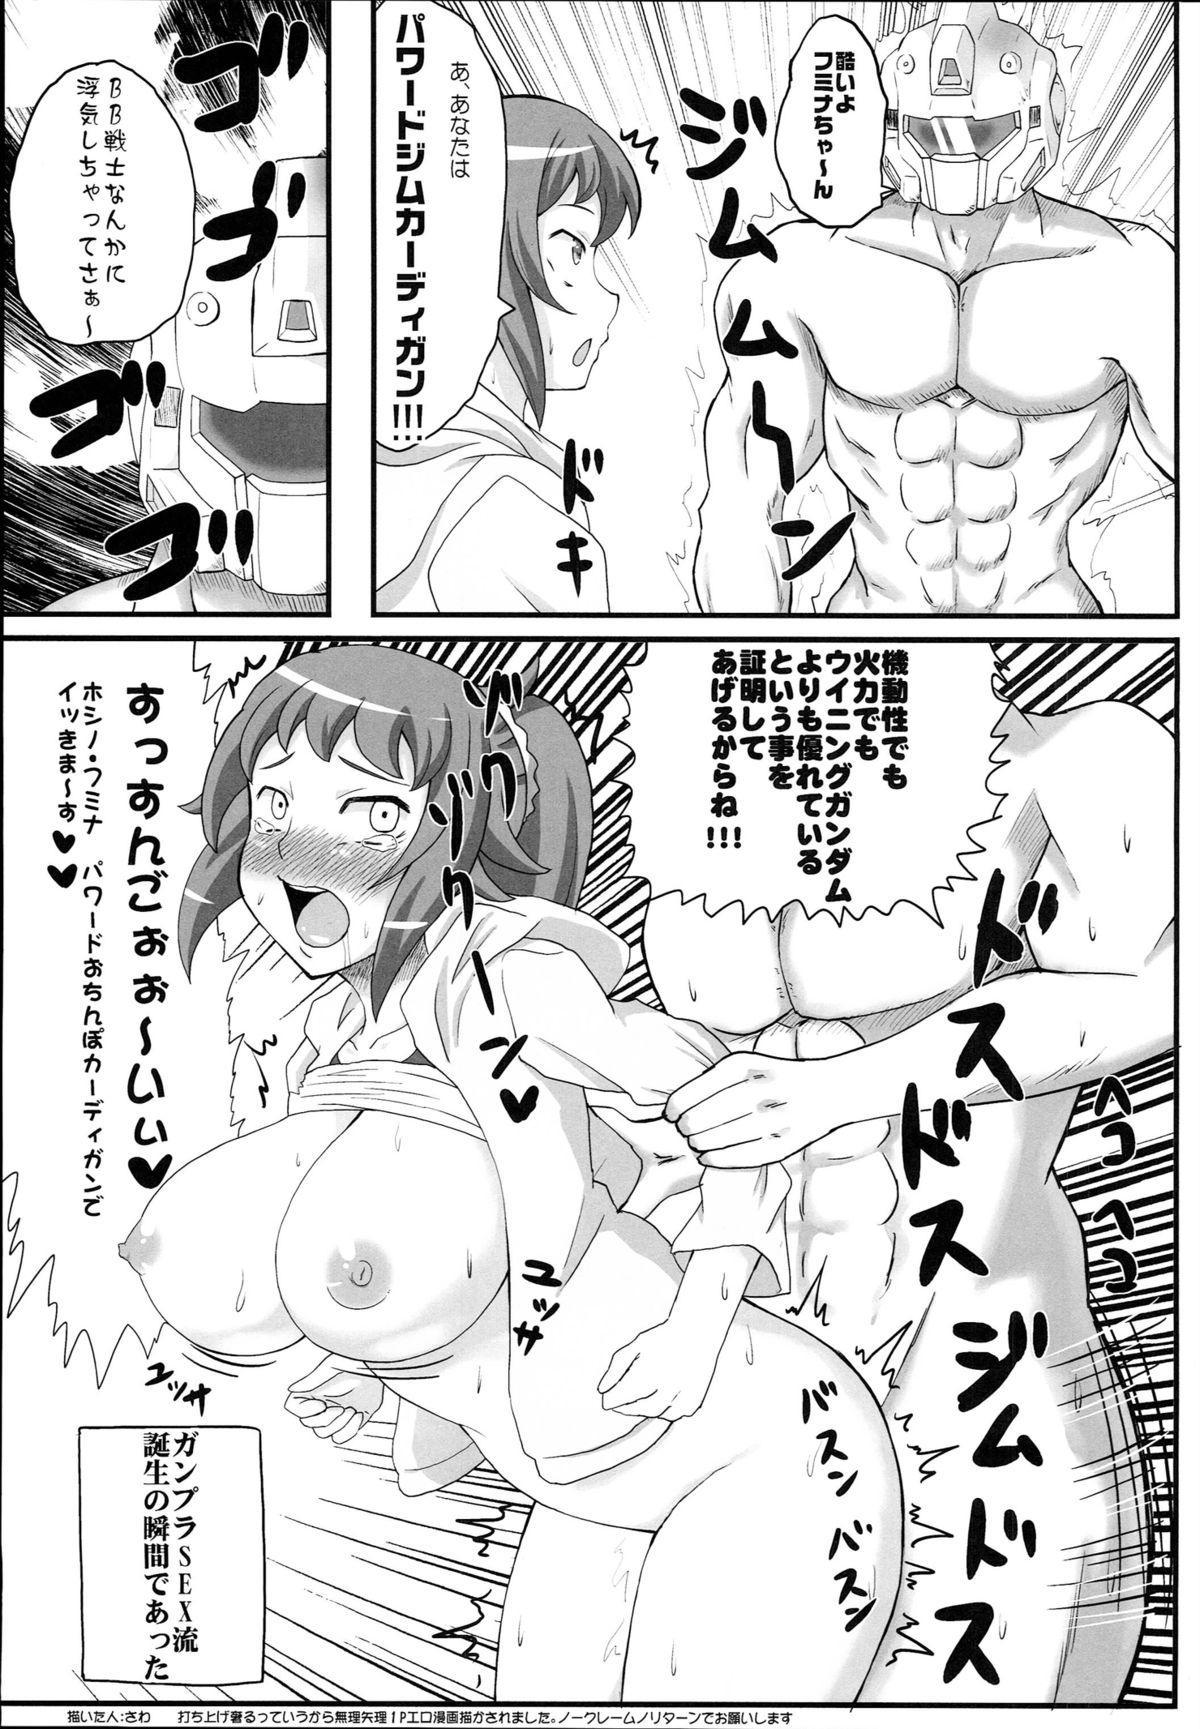 (C87) [from SCRATCH (Johnny) Amatoro Fighters Fumina senpai to Mirai oneechan no baai  (Gundam Build Fighters Try) 35